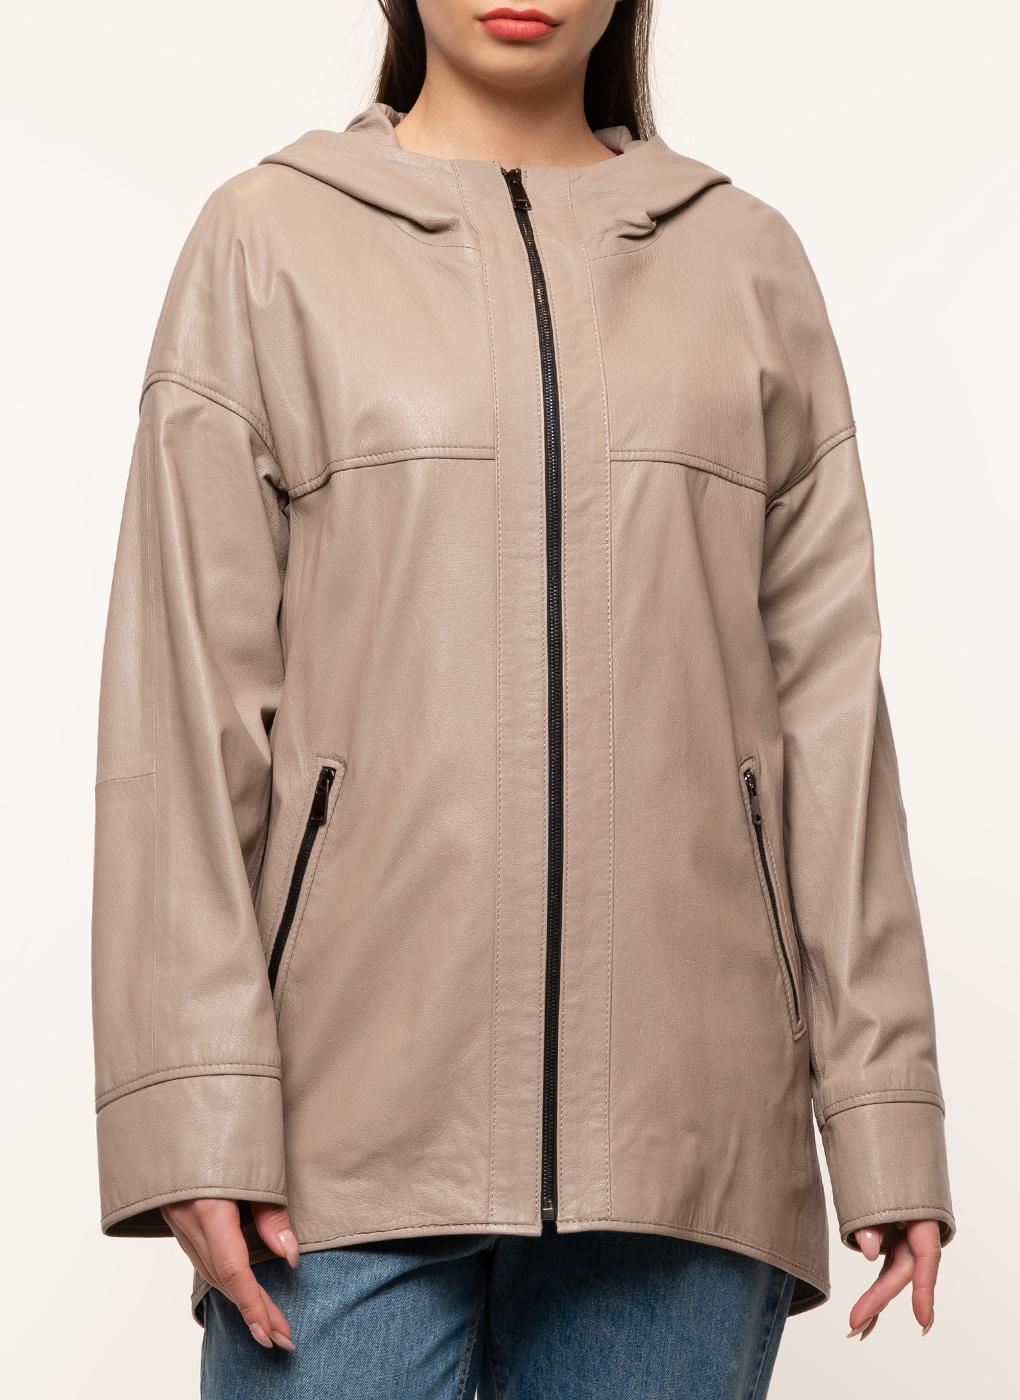 Кожаная куртка 23, Imperiafabrik фото